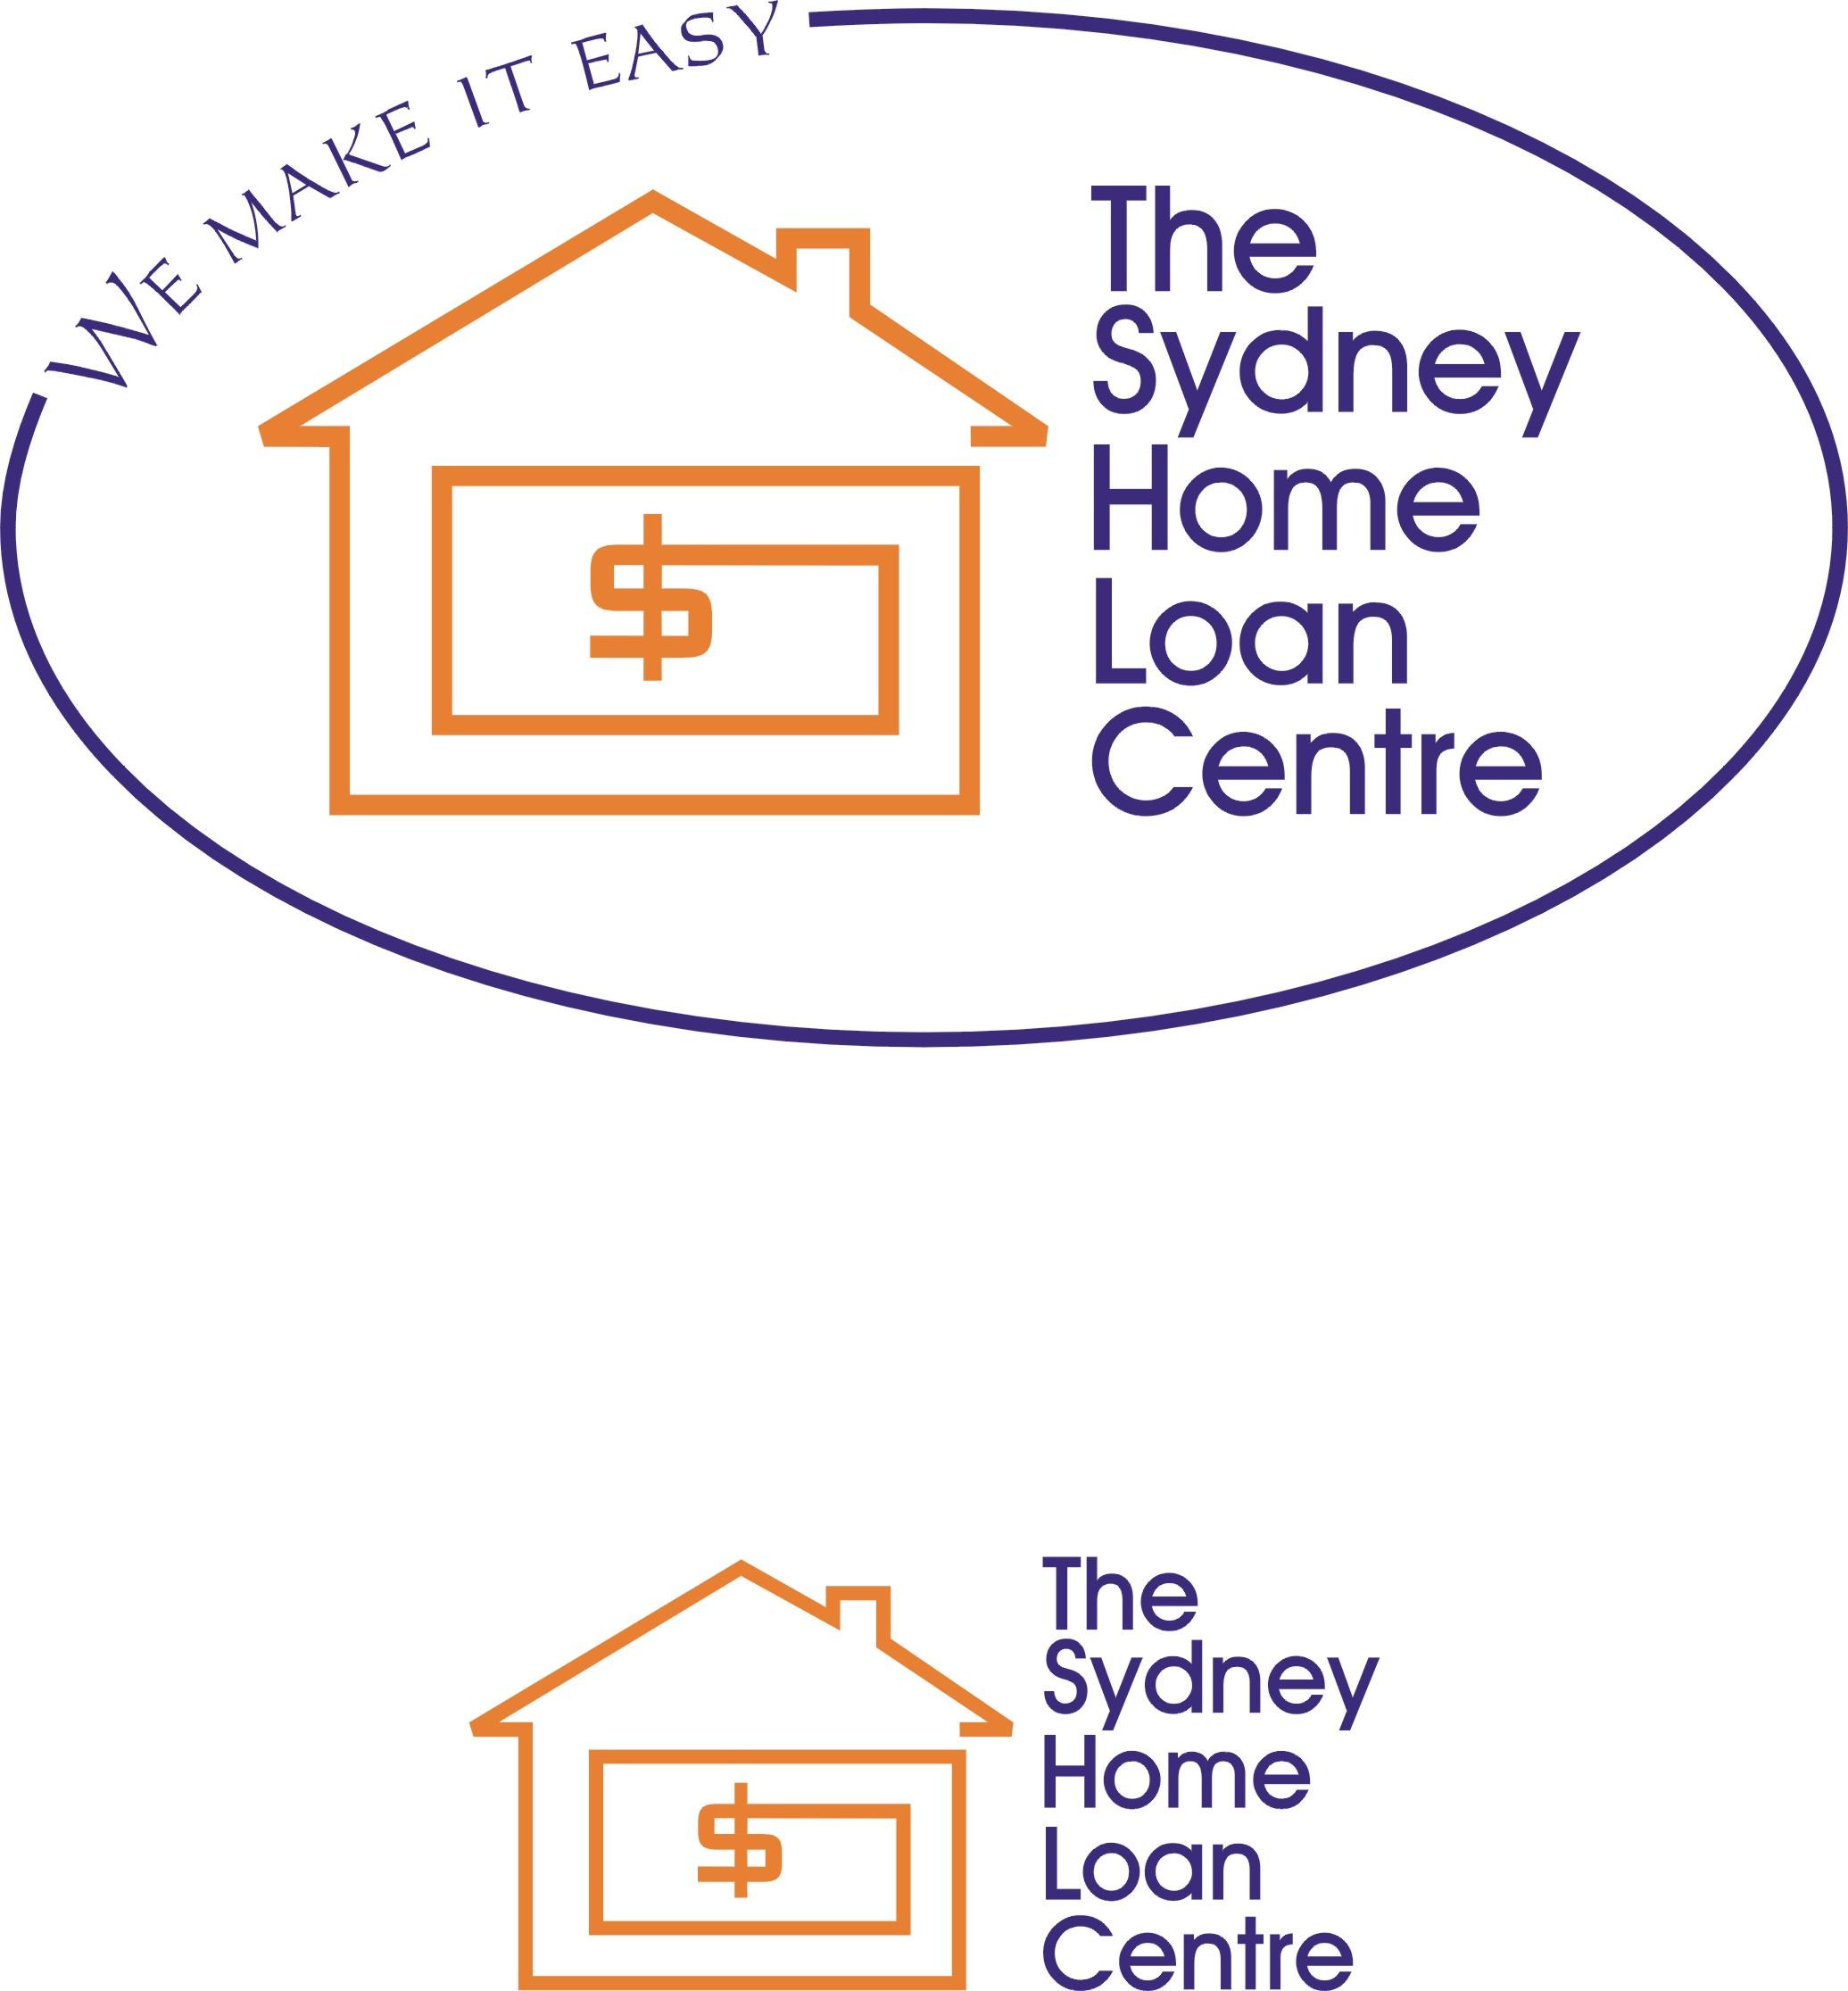 logo design by eve design for the sydney home loan centre | design #9737